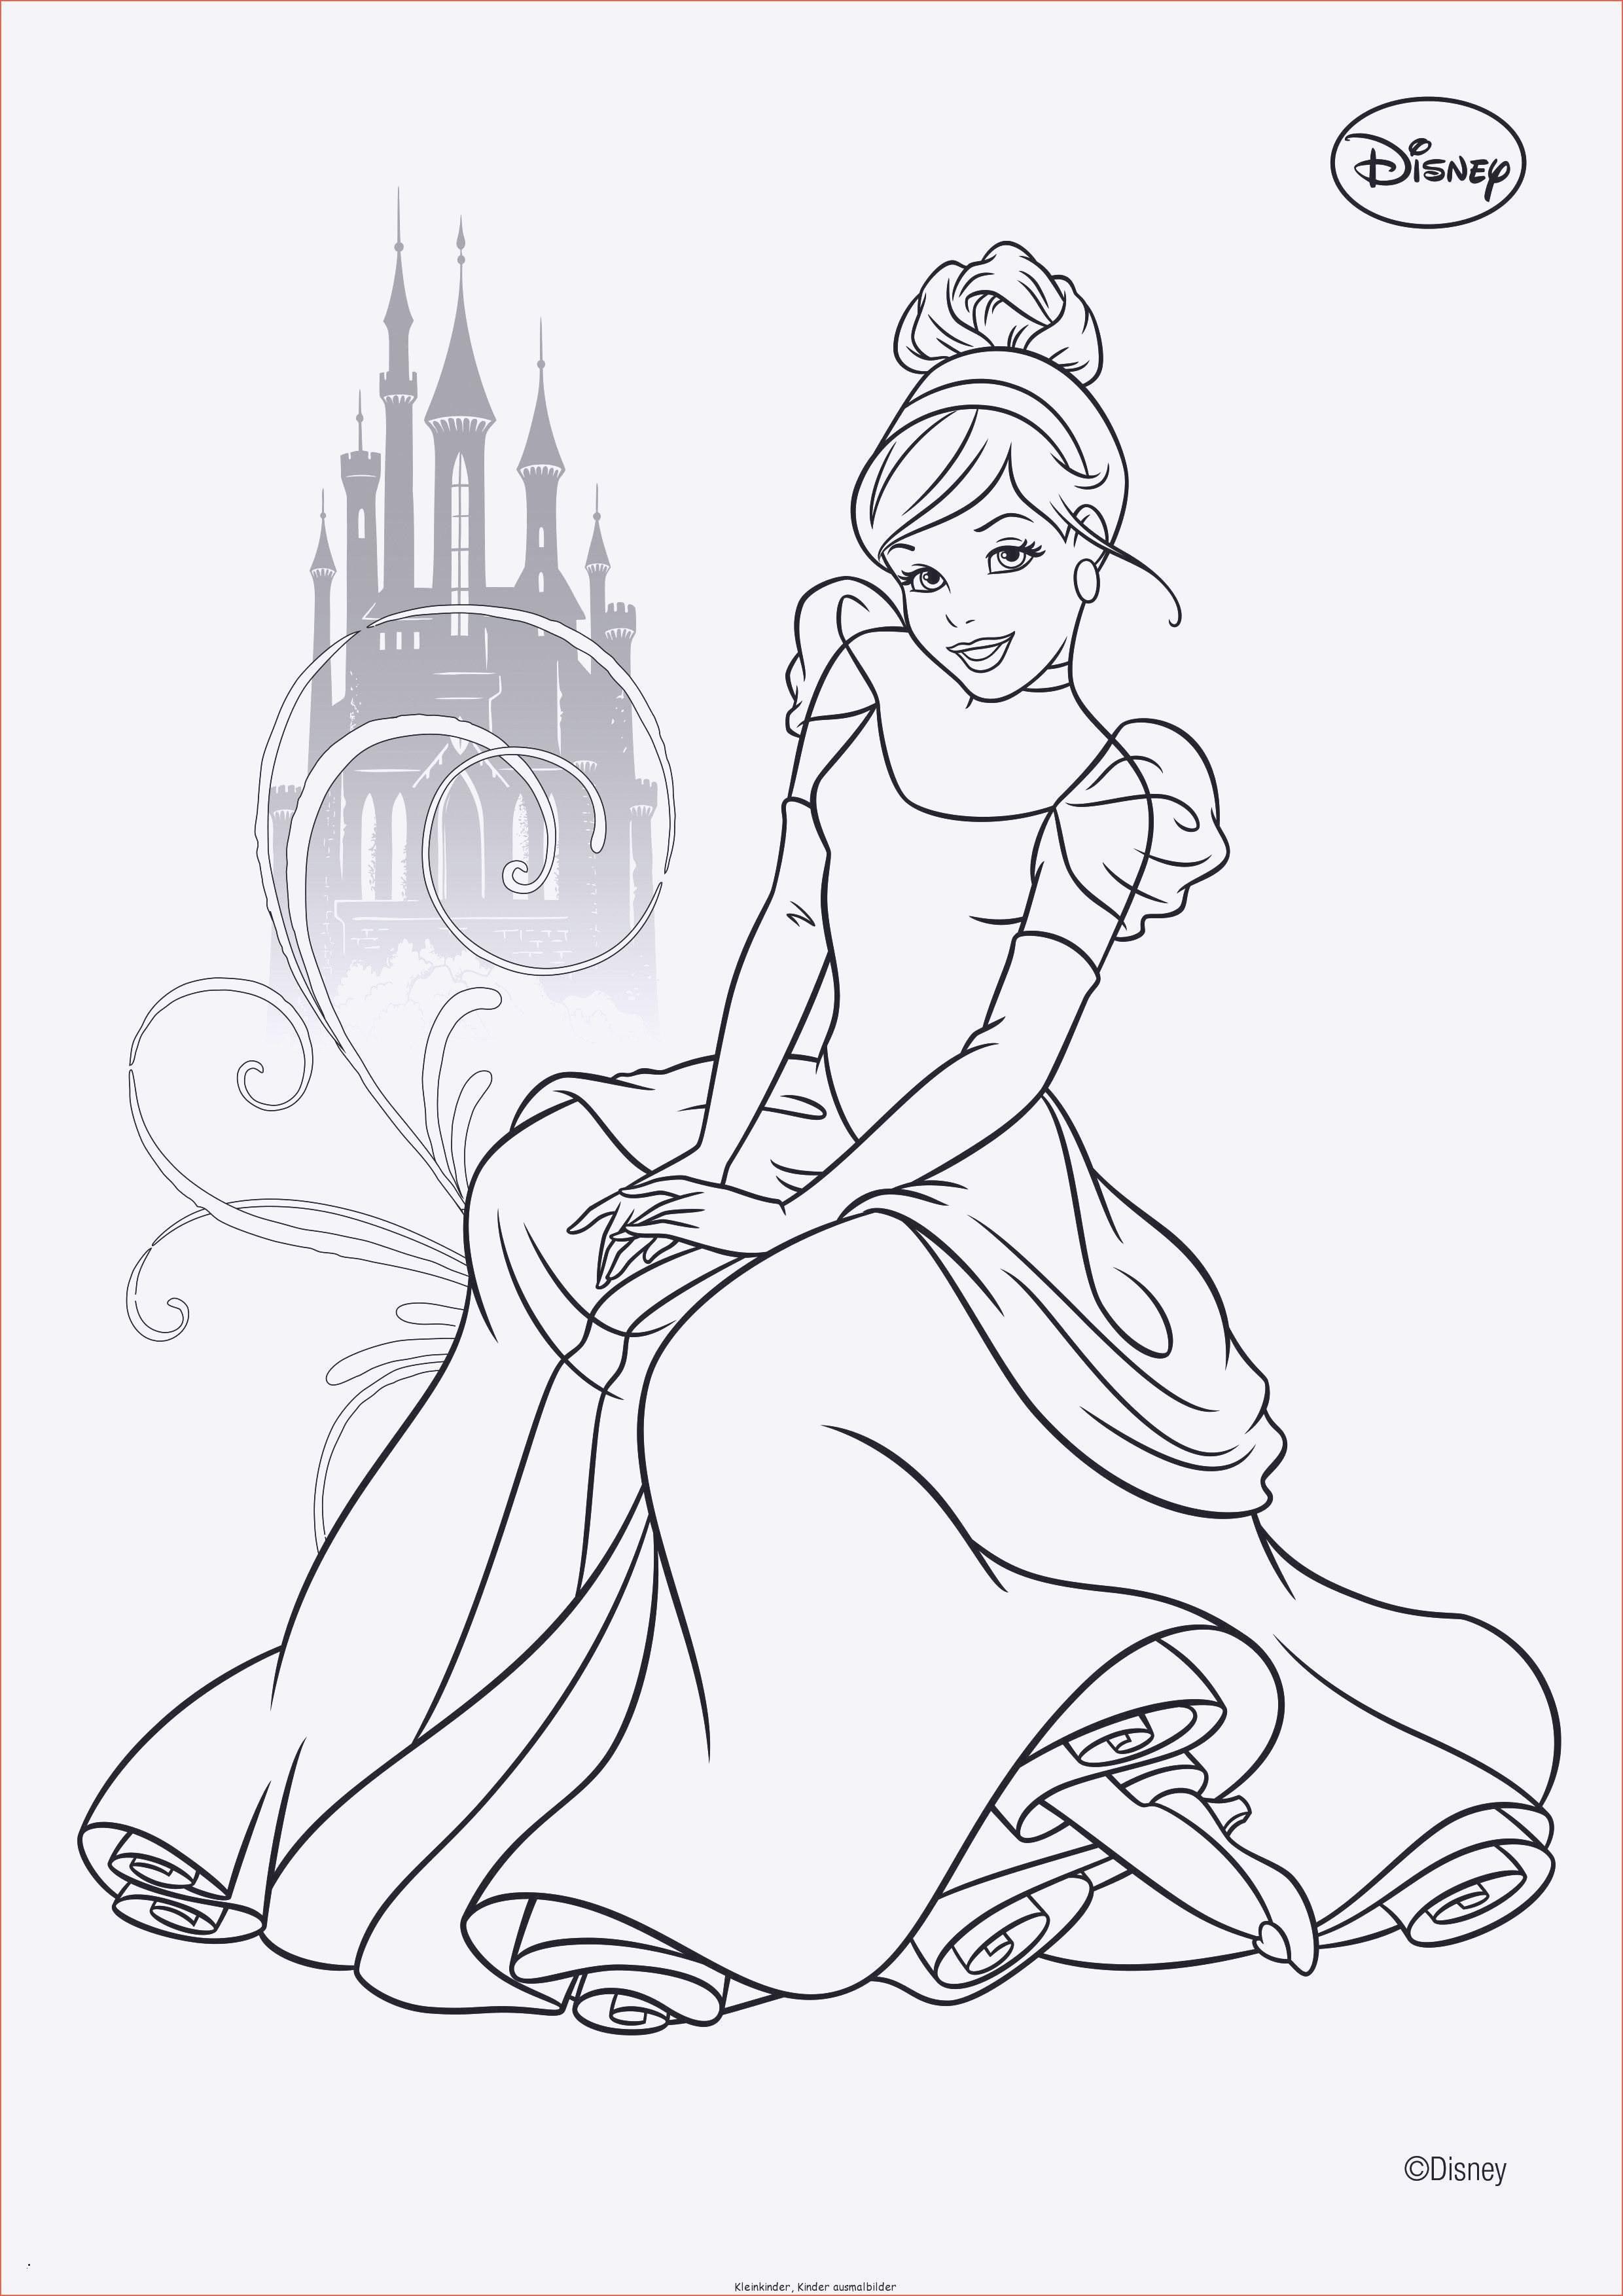 Ausmalbilder Disney Prinzessin Jasmin Einzigartig 48 Schöpfung Ausmalbilder Prinzessin Elsa Treehouse Nyc Stock